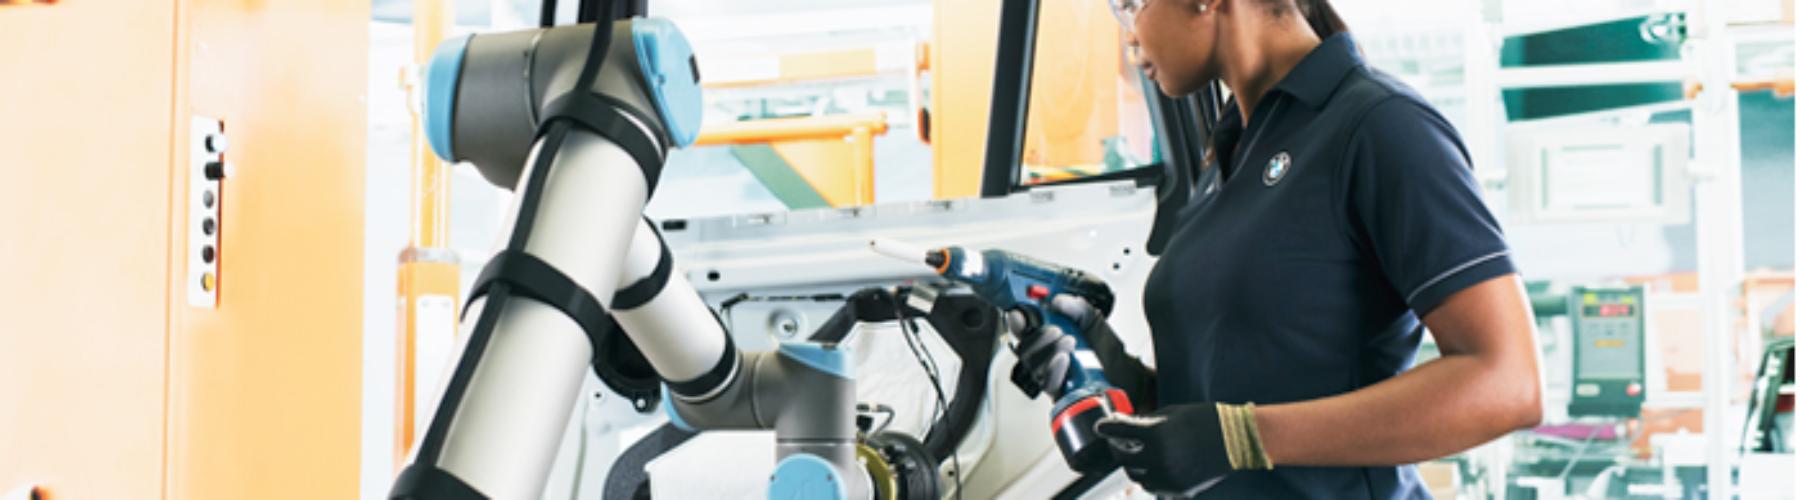 Robótica inovadora - O Universal Robot na BMW